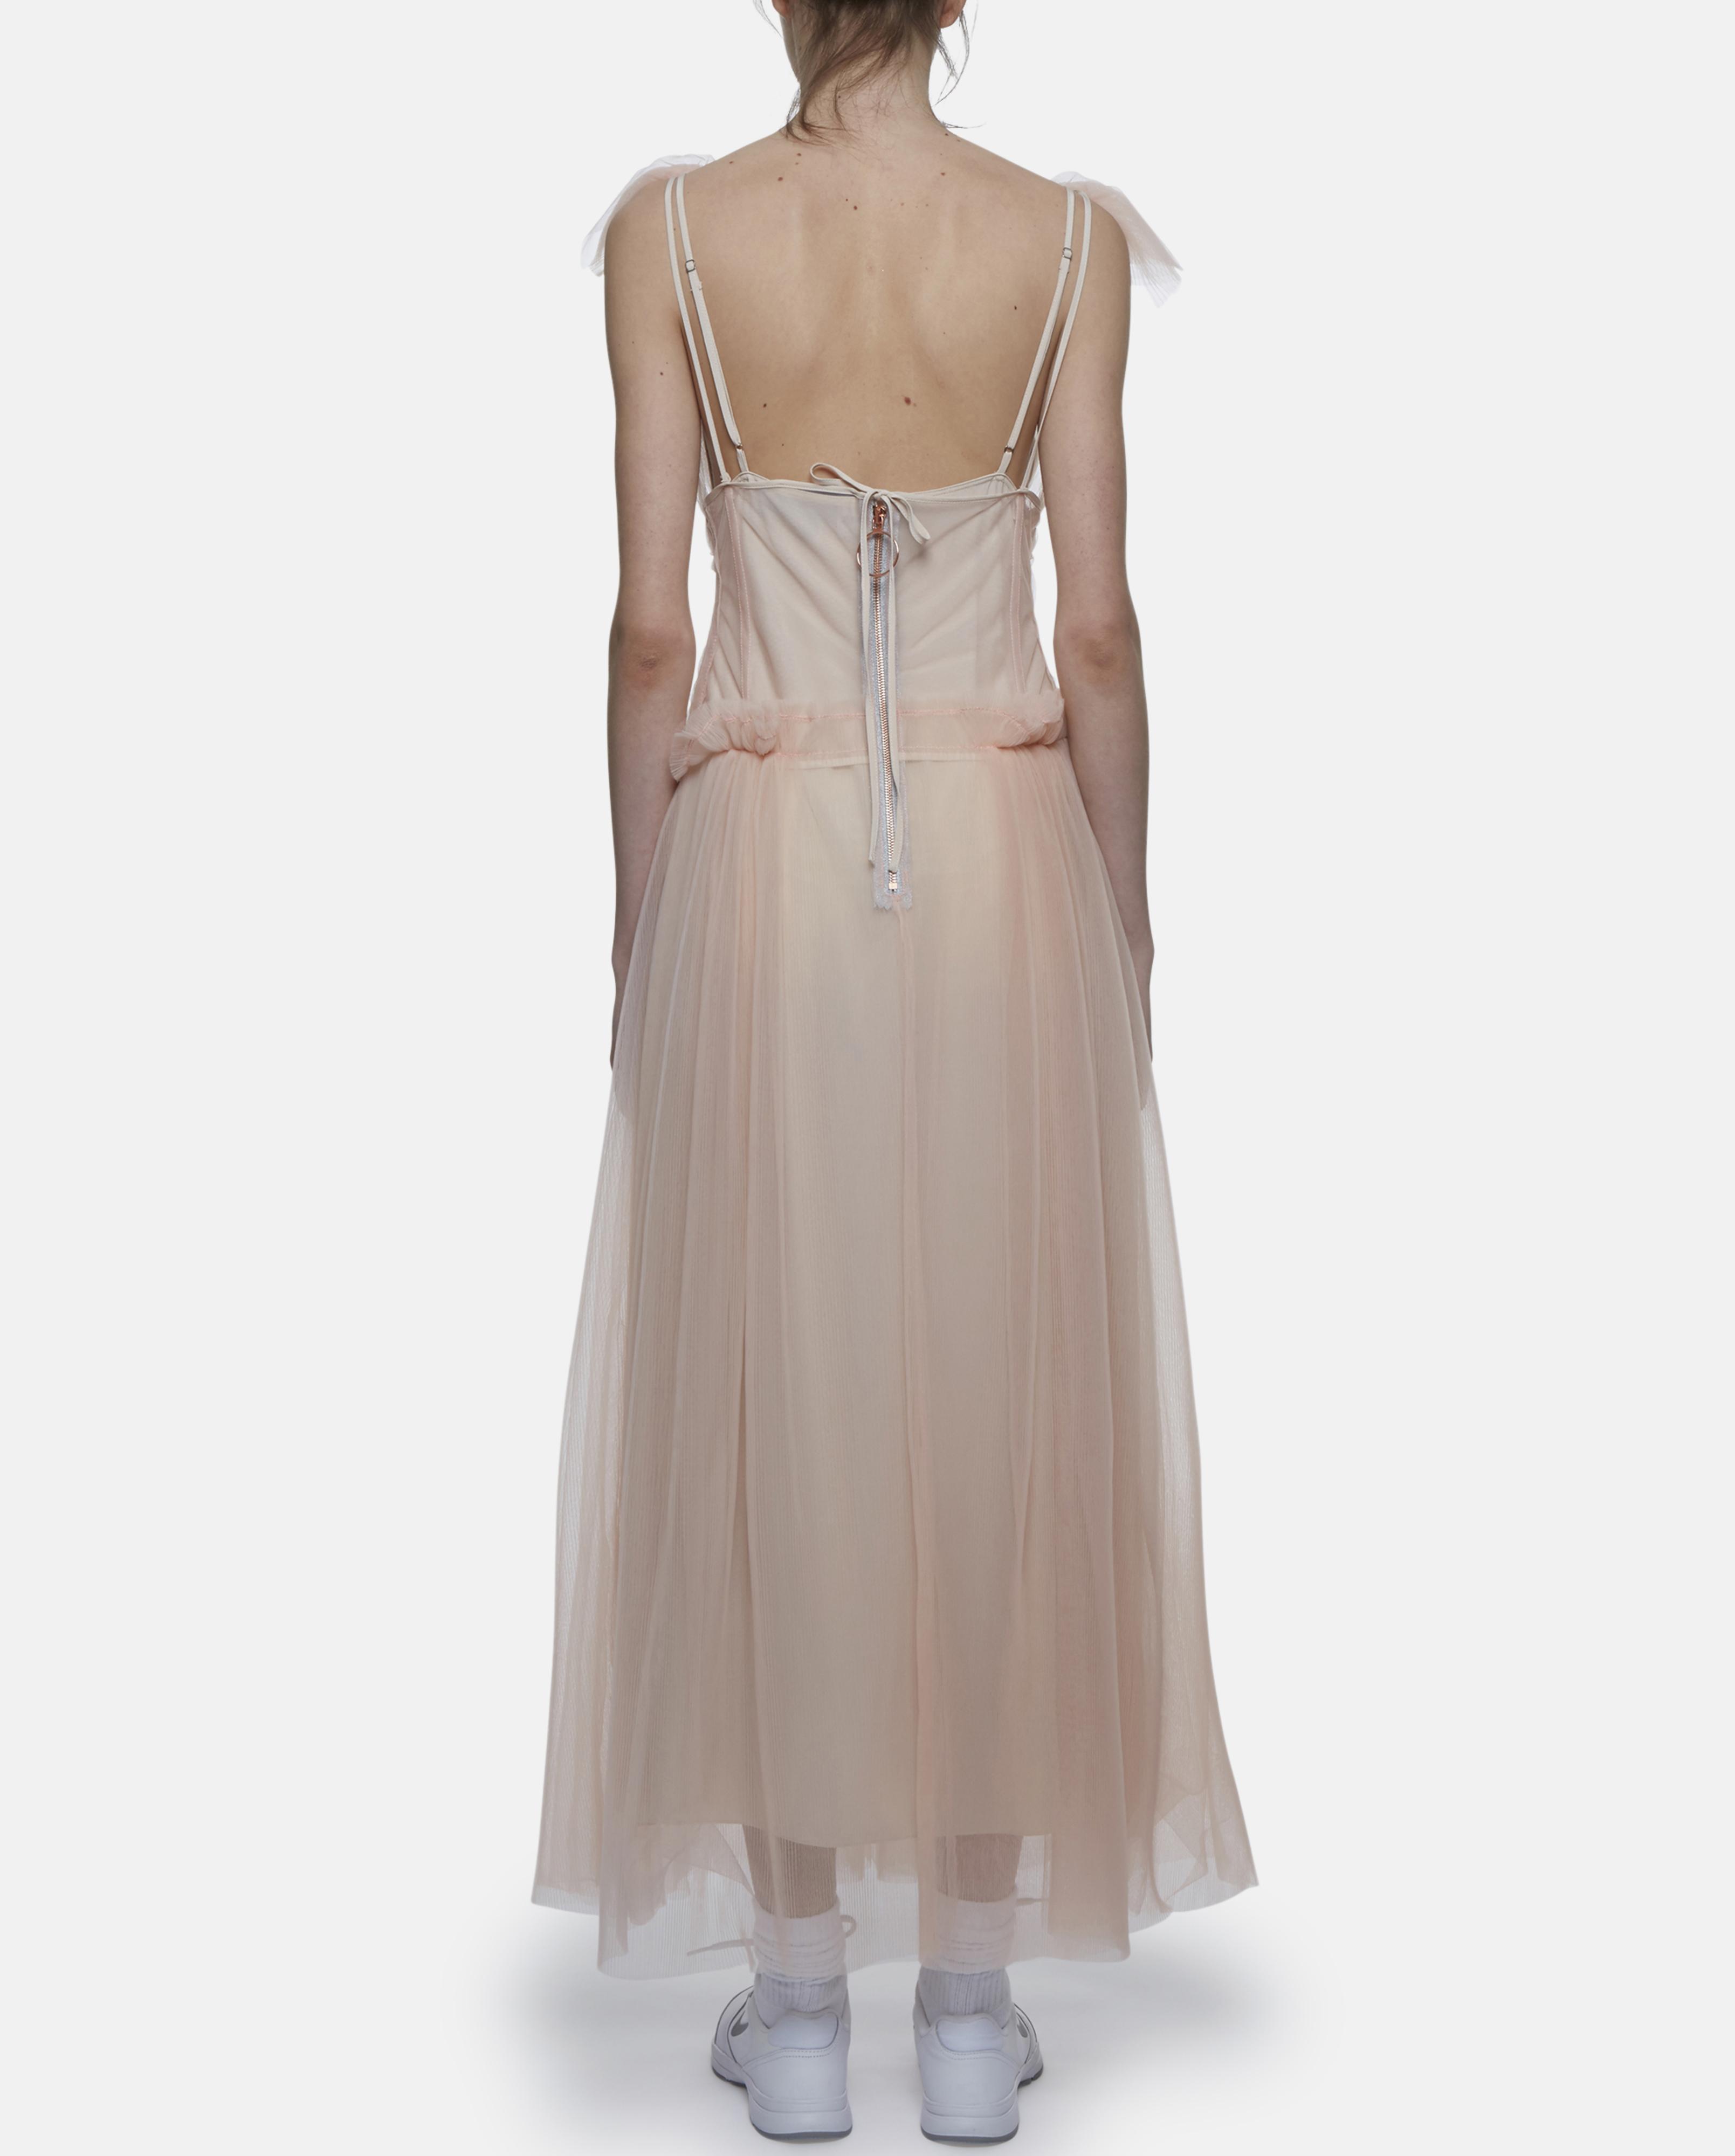 DRESSES - Short dresses NICOPANDA TxaZ3b